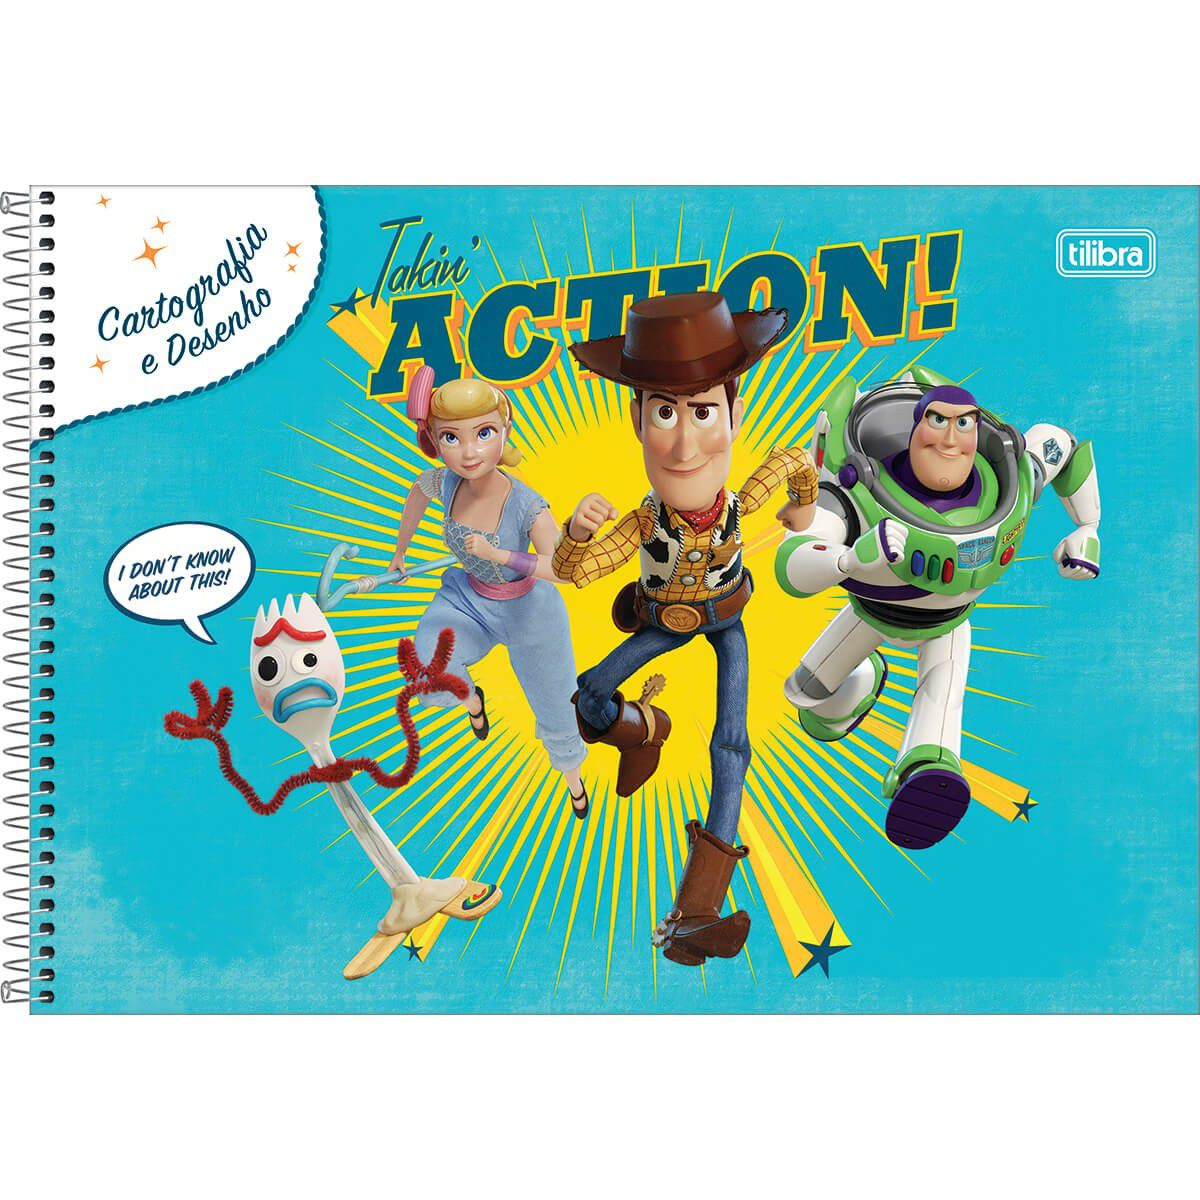 Caderno Tilibra Capa Dura Cartografia Espiral Toy Story 80 Fls 309109 27853